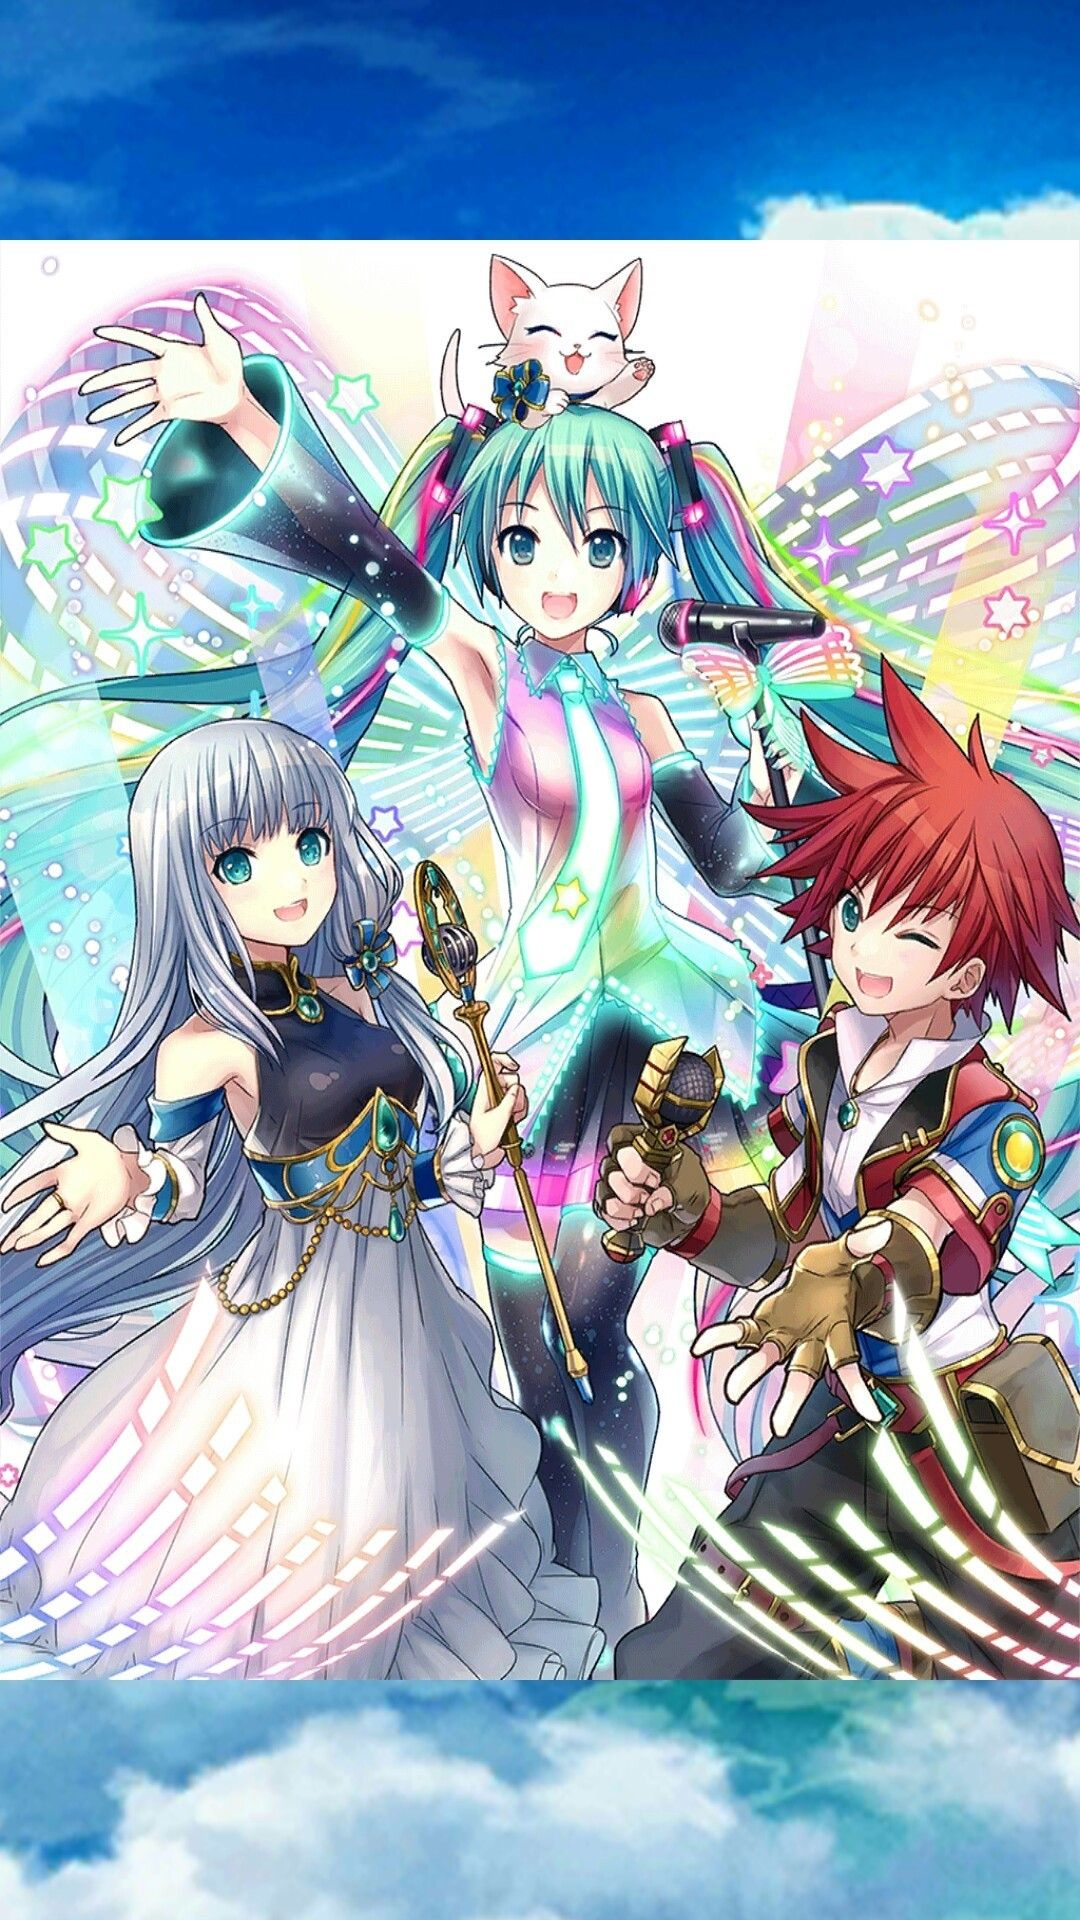 Pin by Kairu カイル on Vocaloids Anime, Hatsune miku, Vocaloid